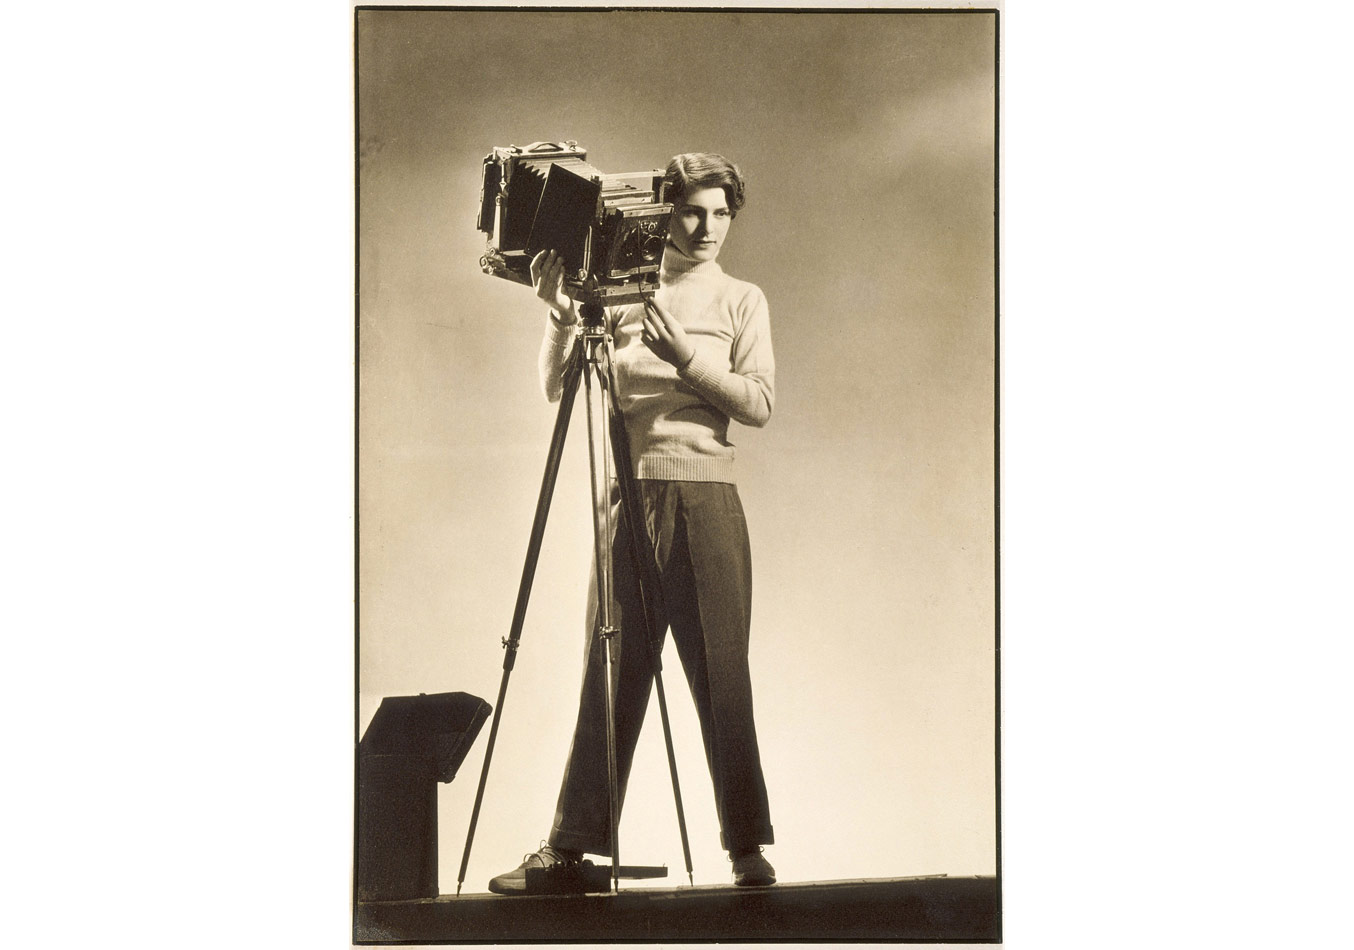 Margaret Bourke-White (1904-1971), Kameralı öz portre © Dijital görüntü: Museum Associates/LACMA/Art Resource NY/Scala, Floransa